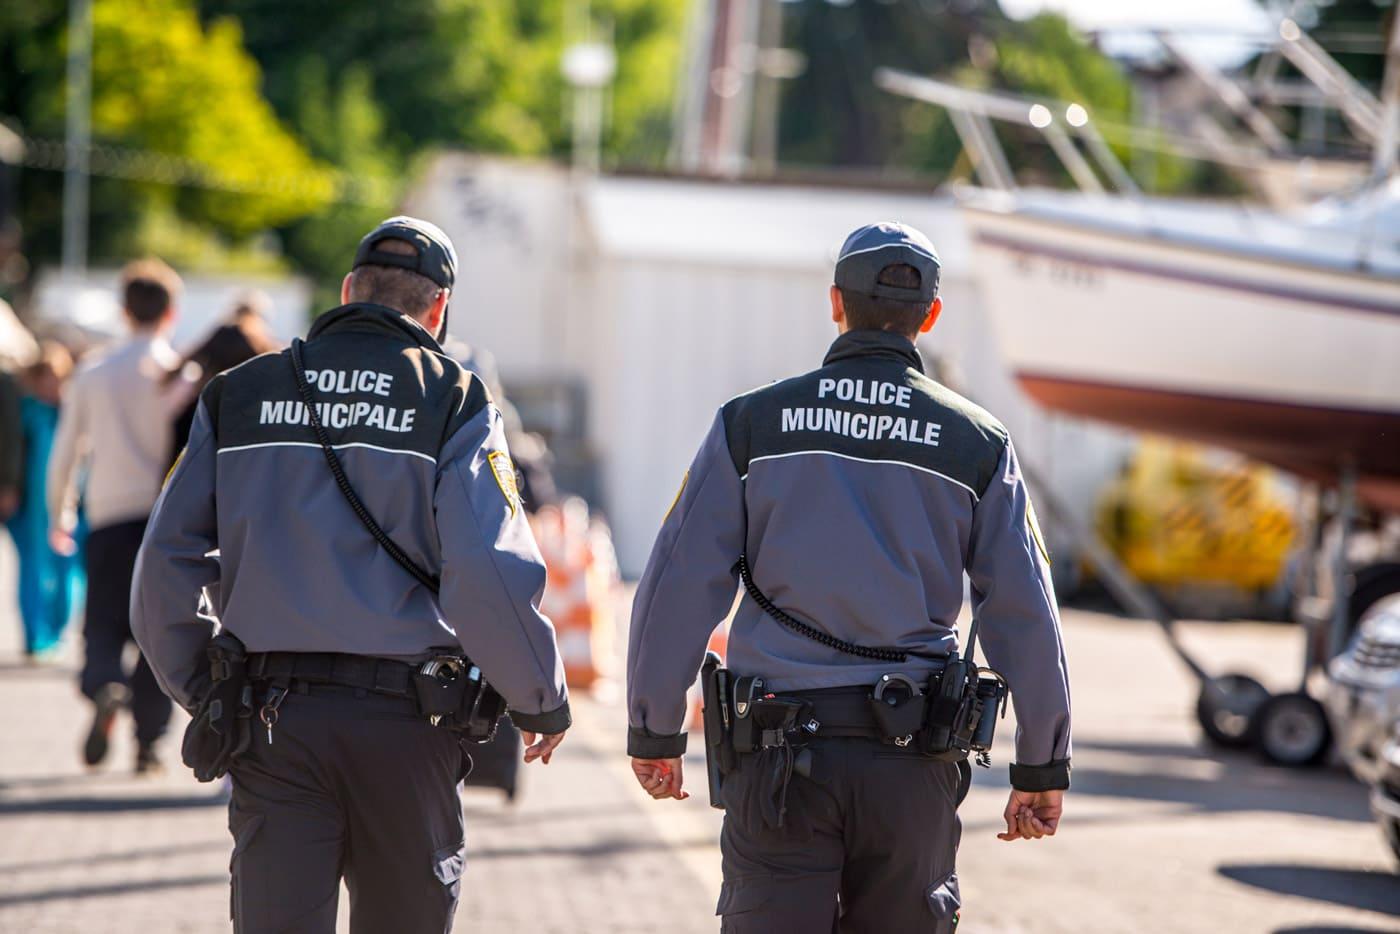 police-municipale-maudet